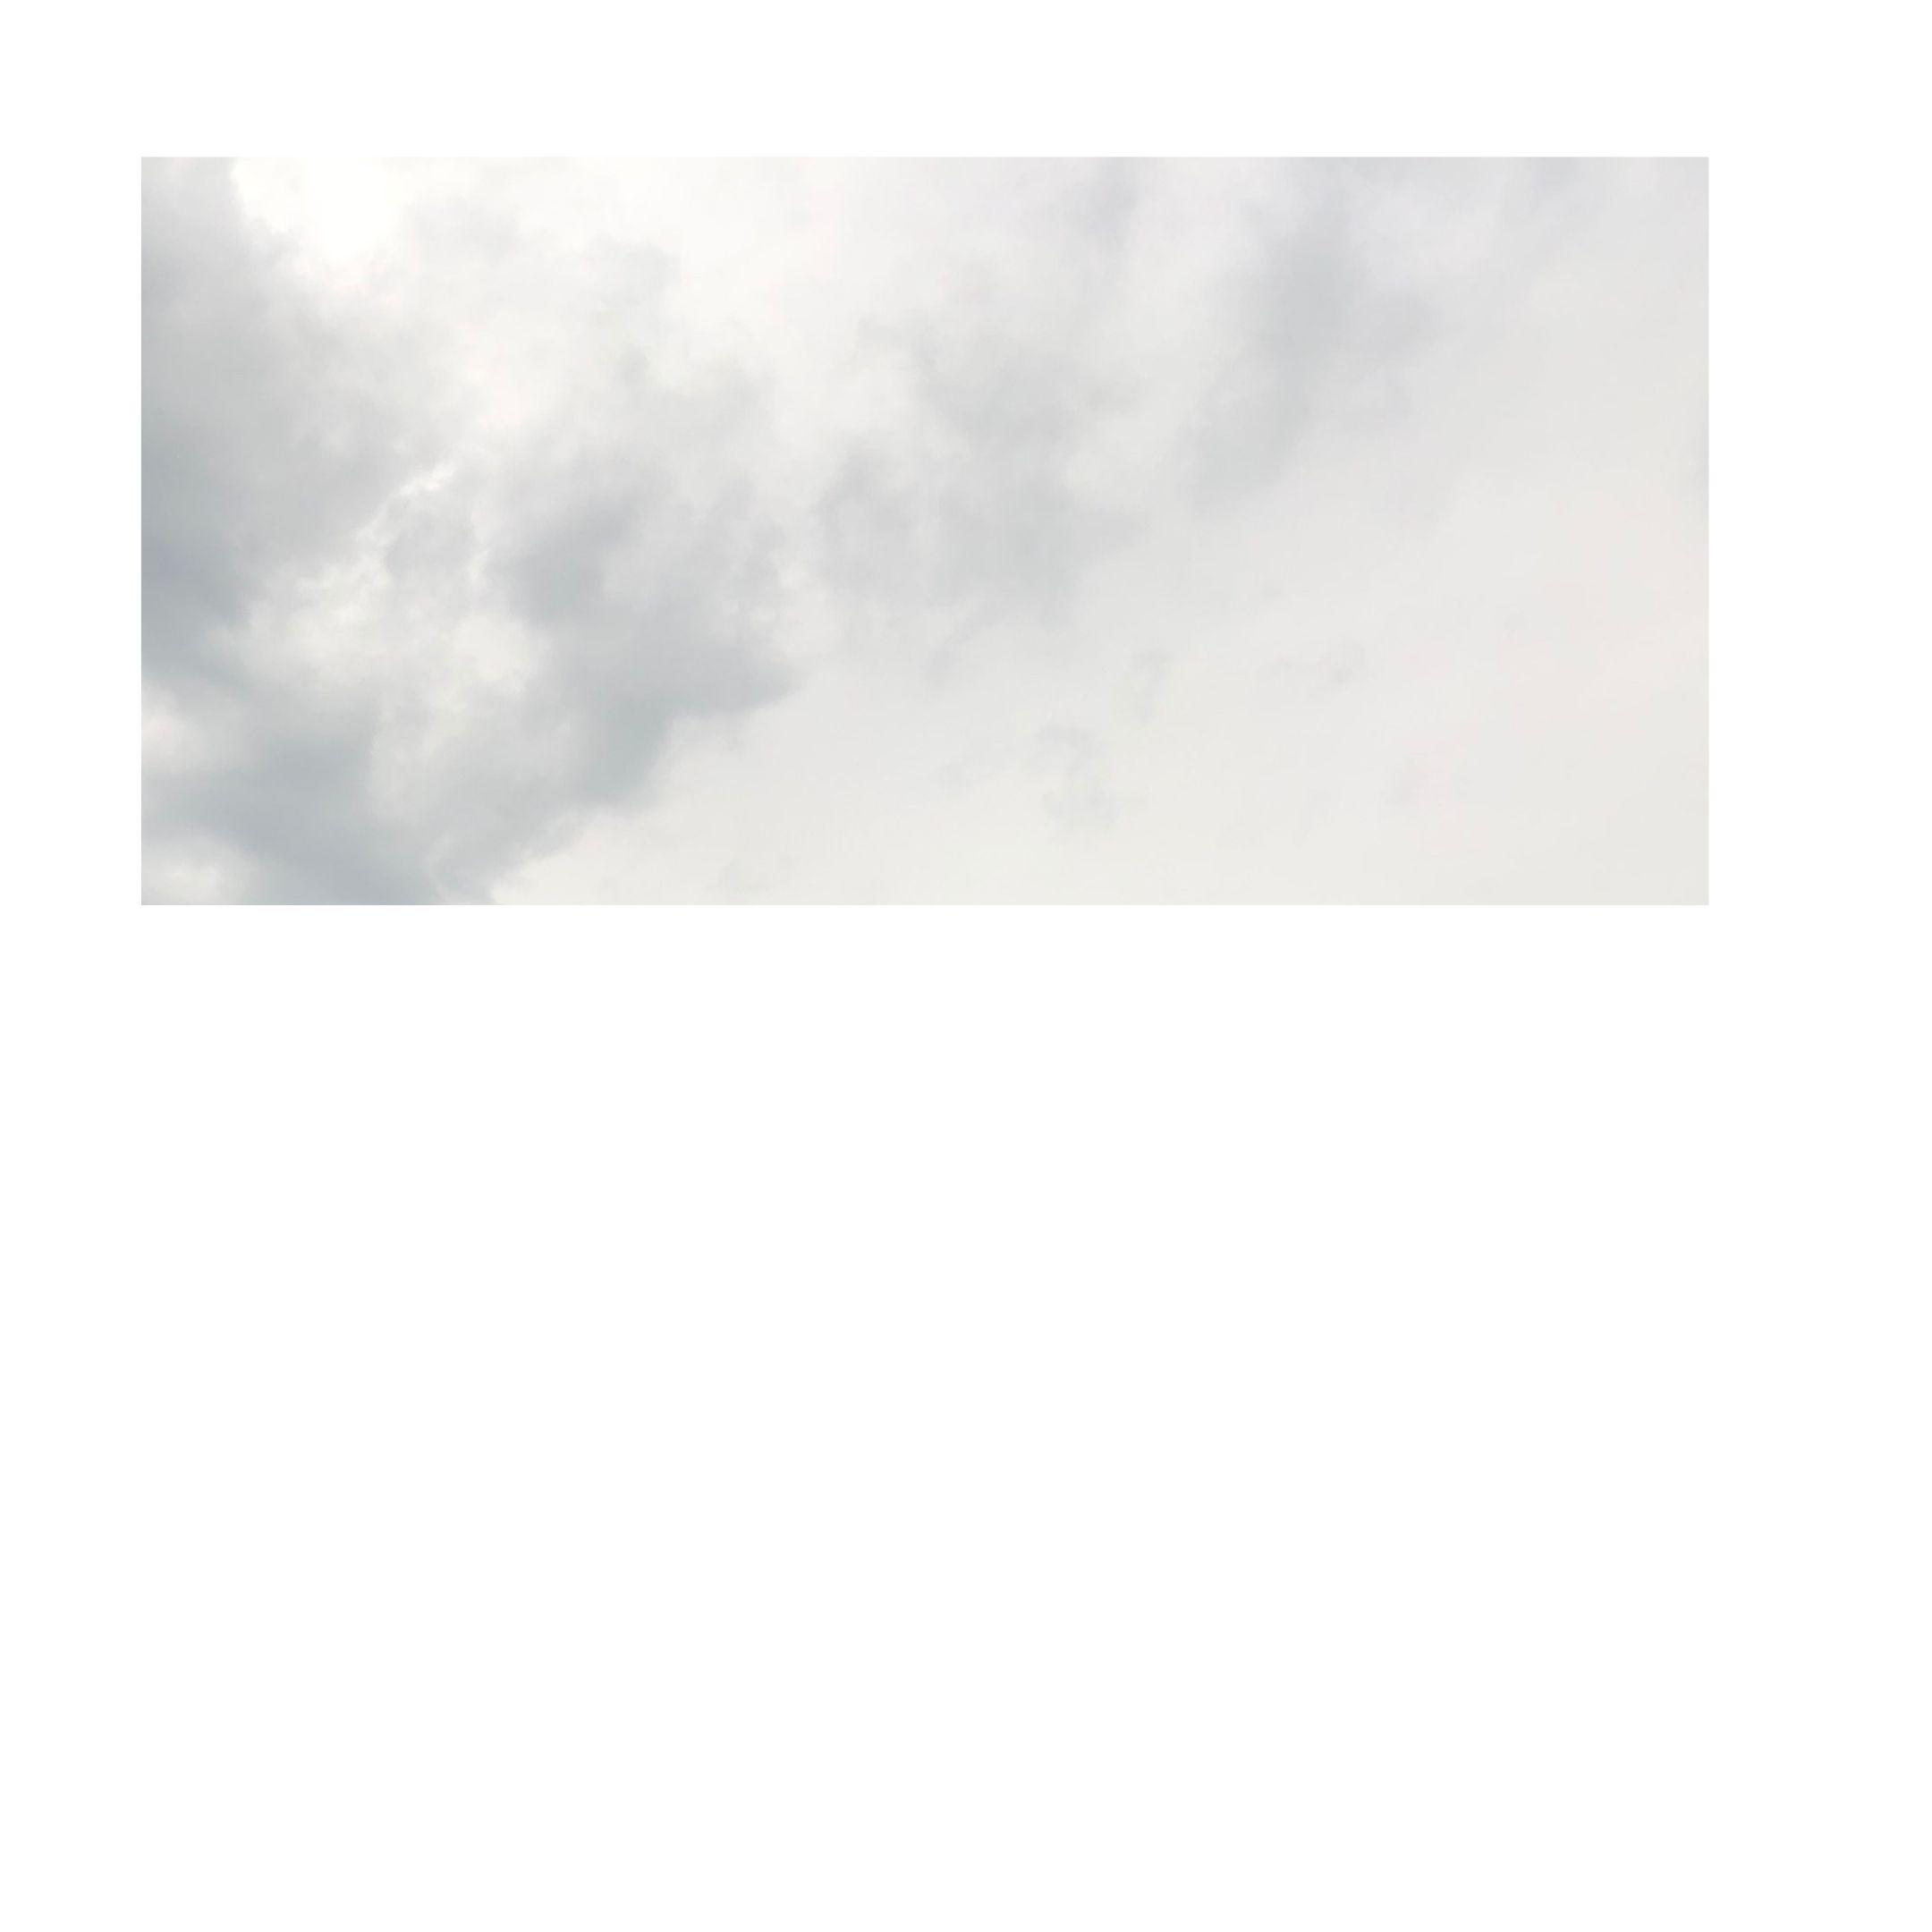 cloud gray sky